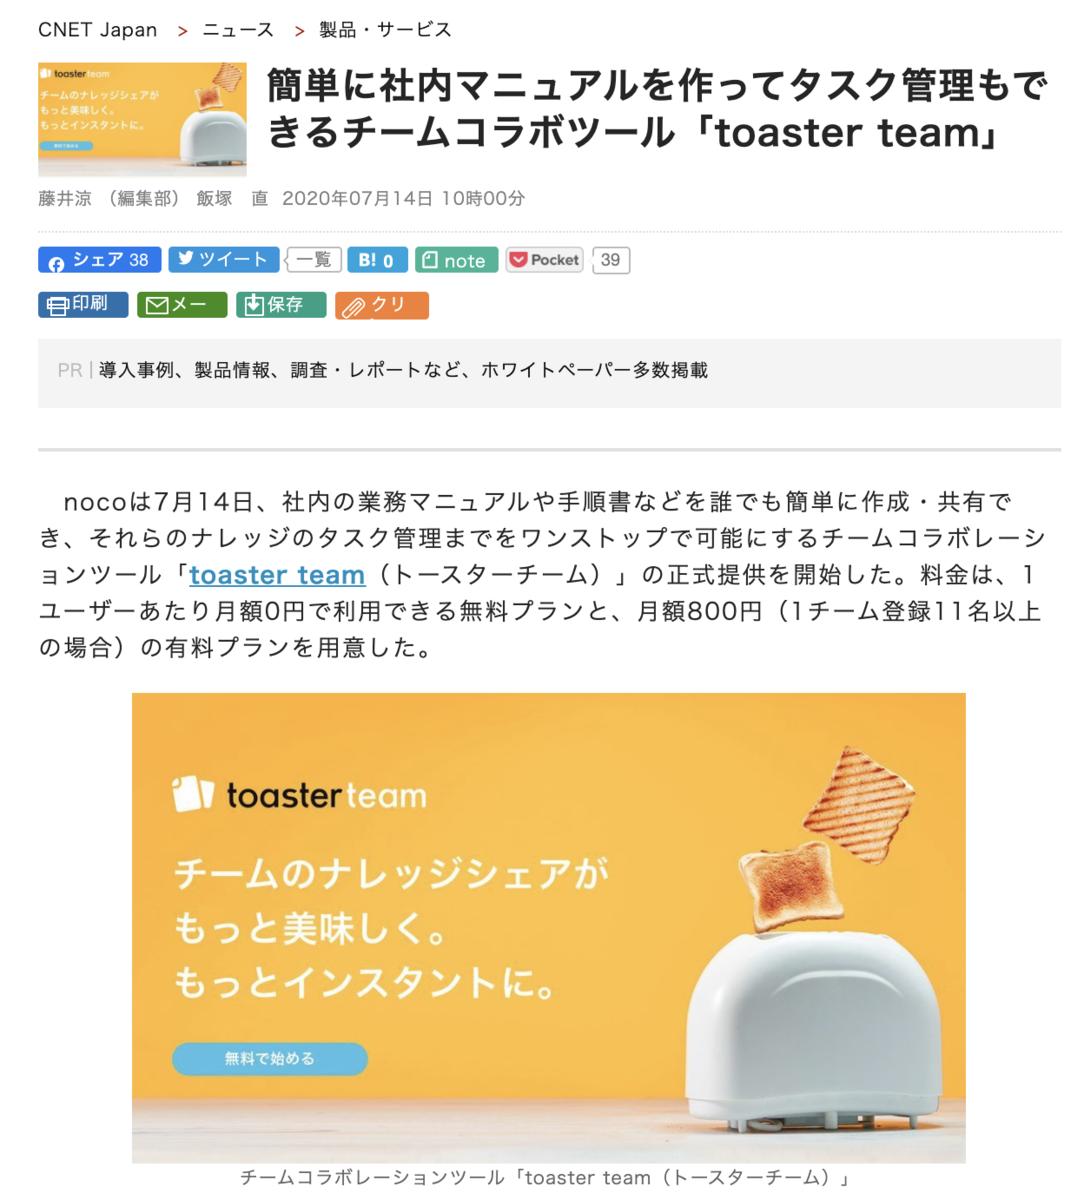 f:id:toasterhow:20200724145709p:plain